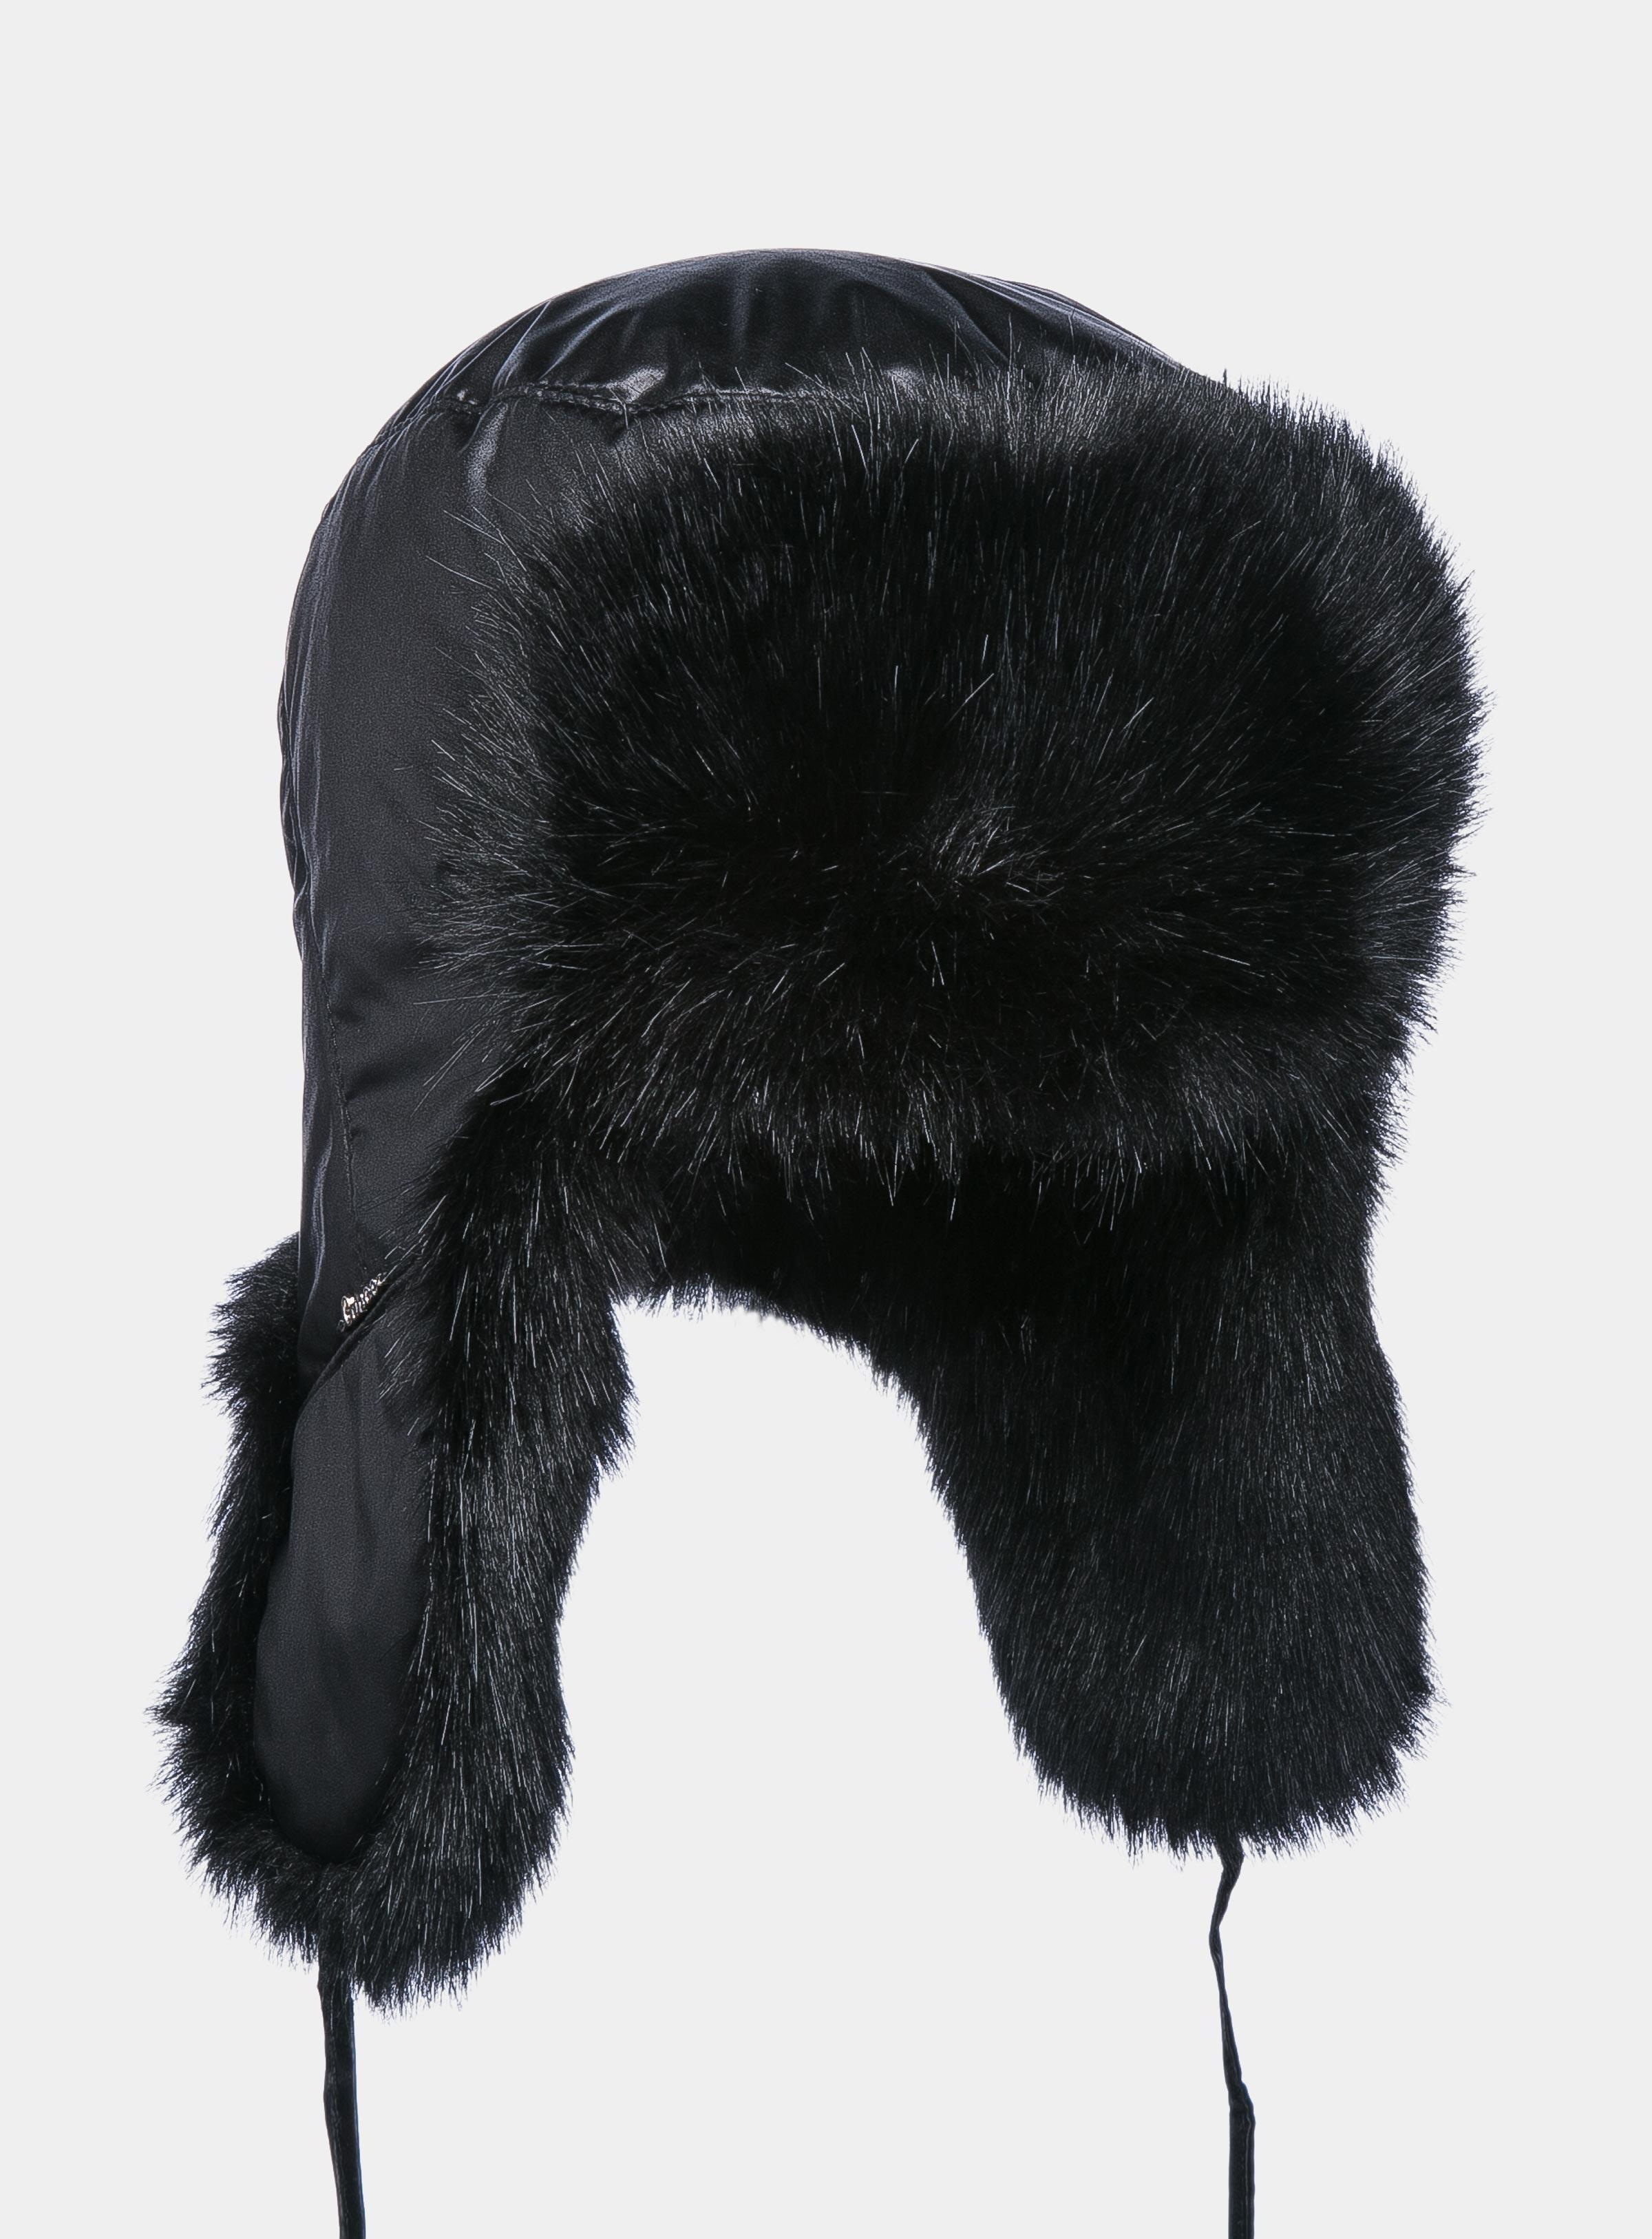 Earflap hat Canoe 3443101 for men fashionable adjustable letters embroidery black baseball hat for men